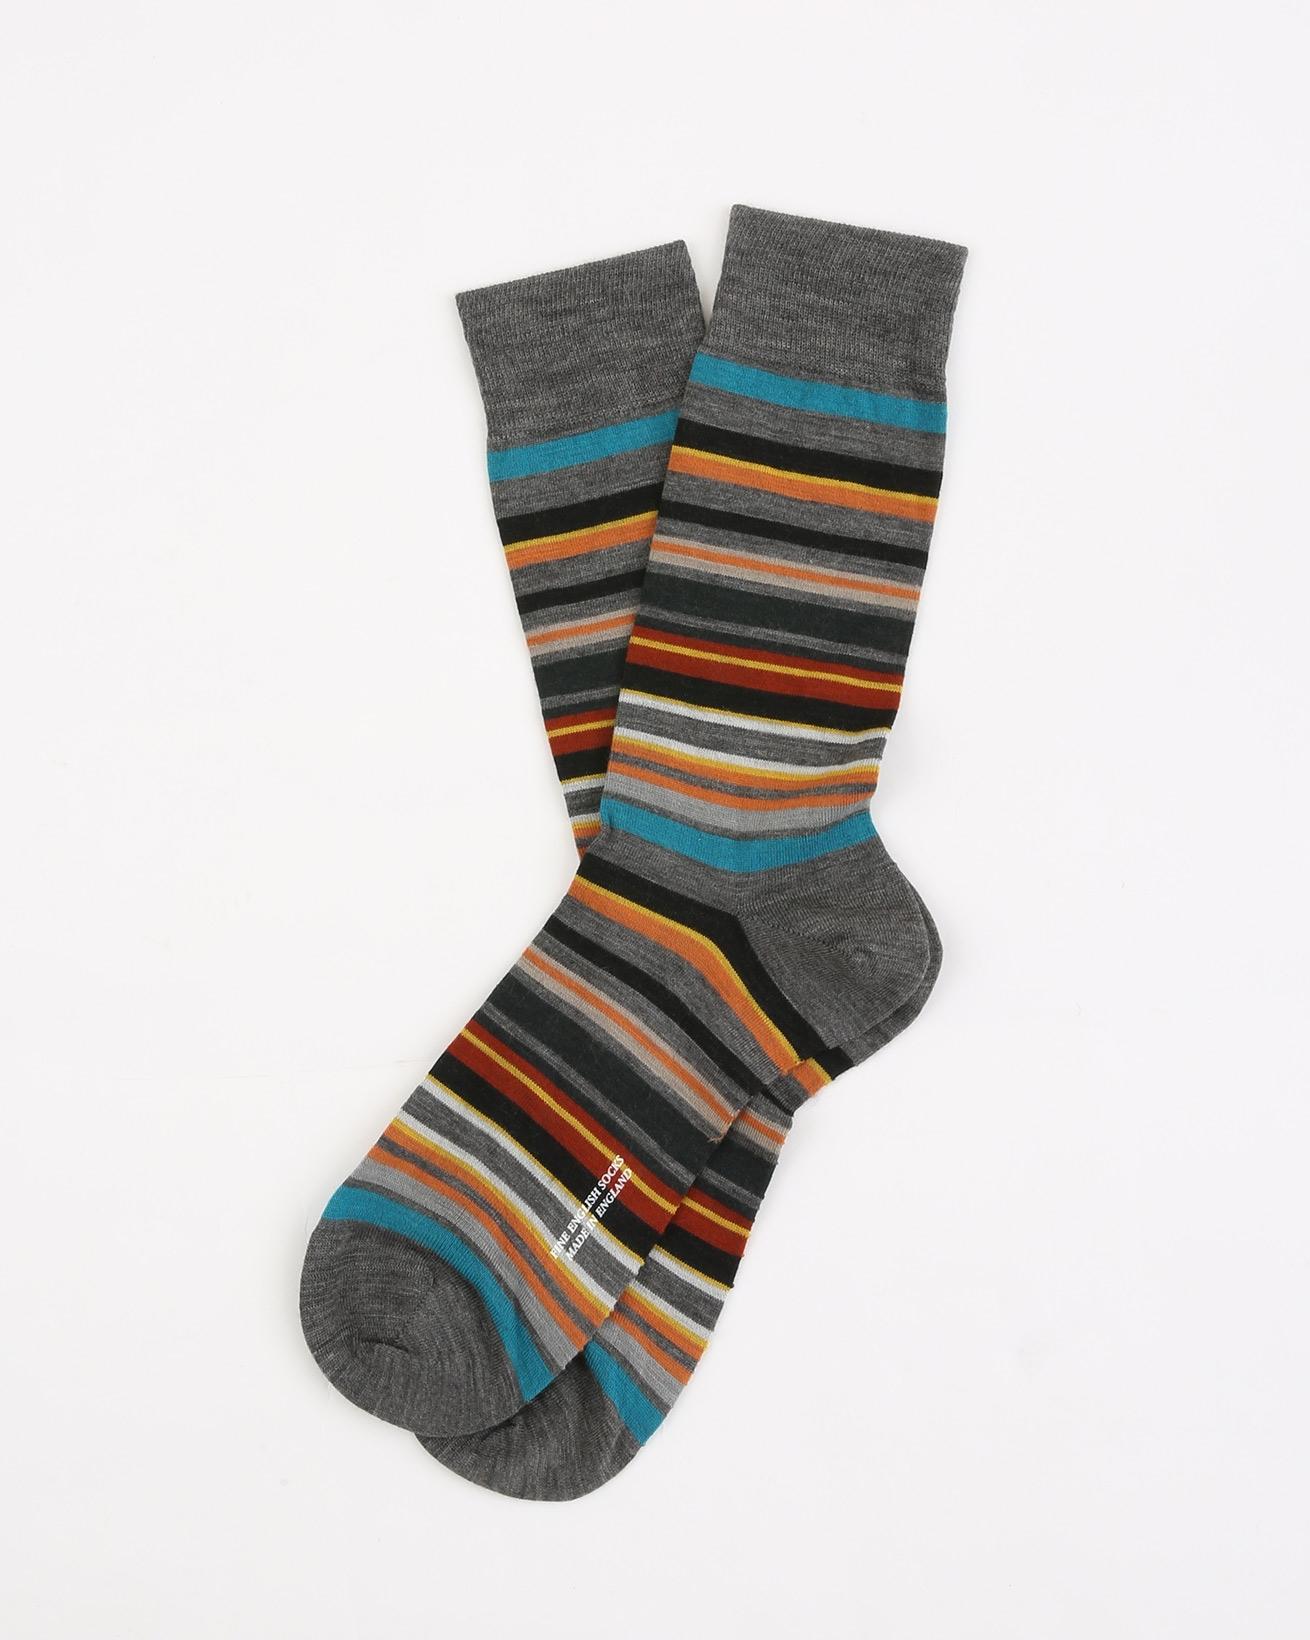 Mens Fine Merino Sock - Size Medium 7.5-9.5 - Mid Grey Multi - 1963